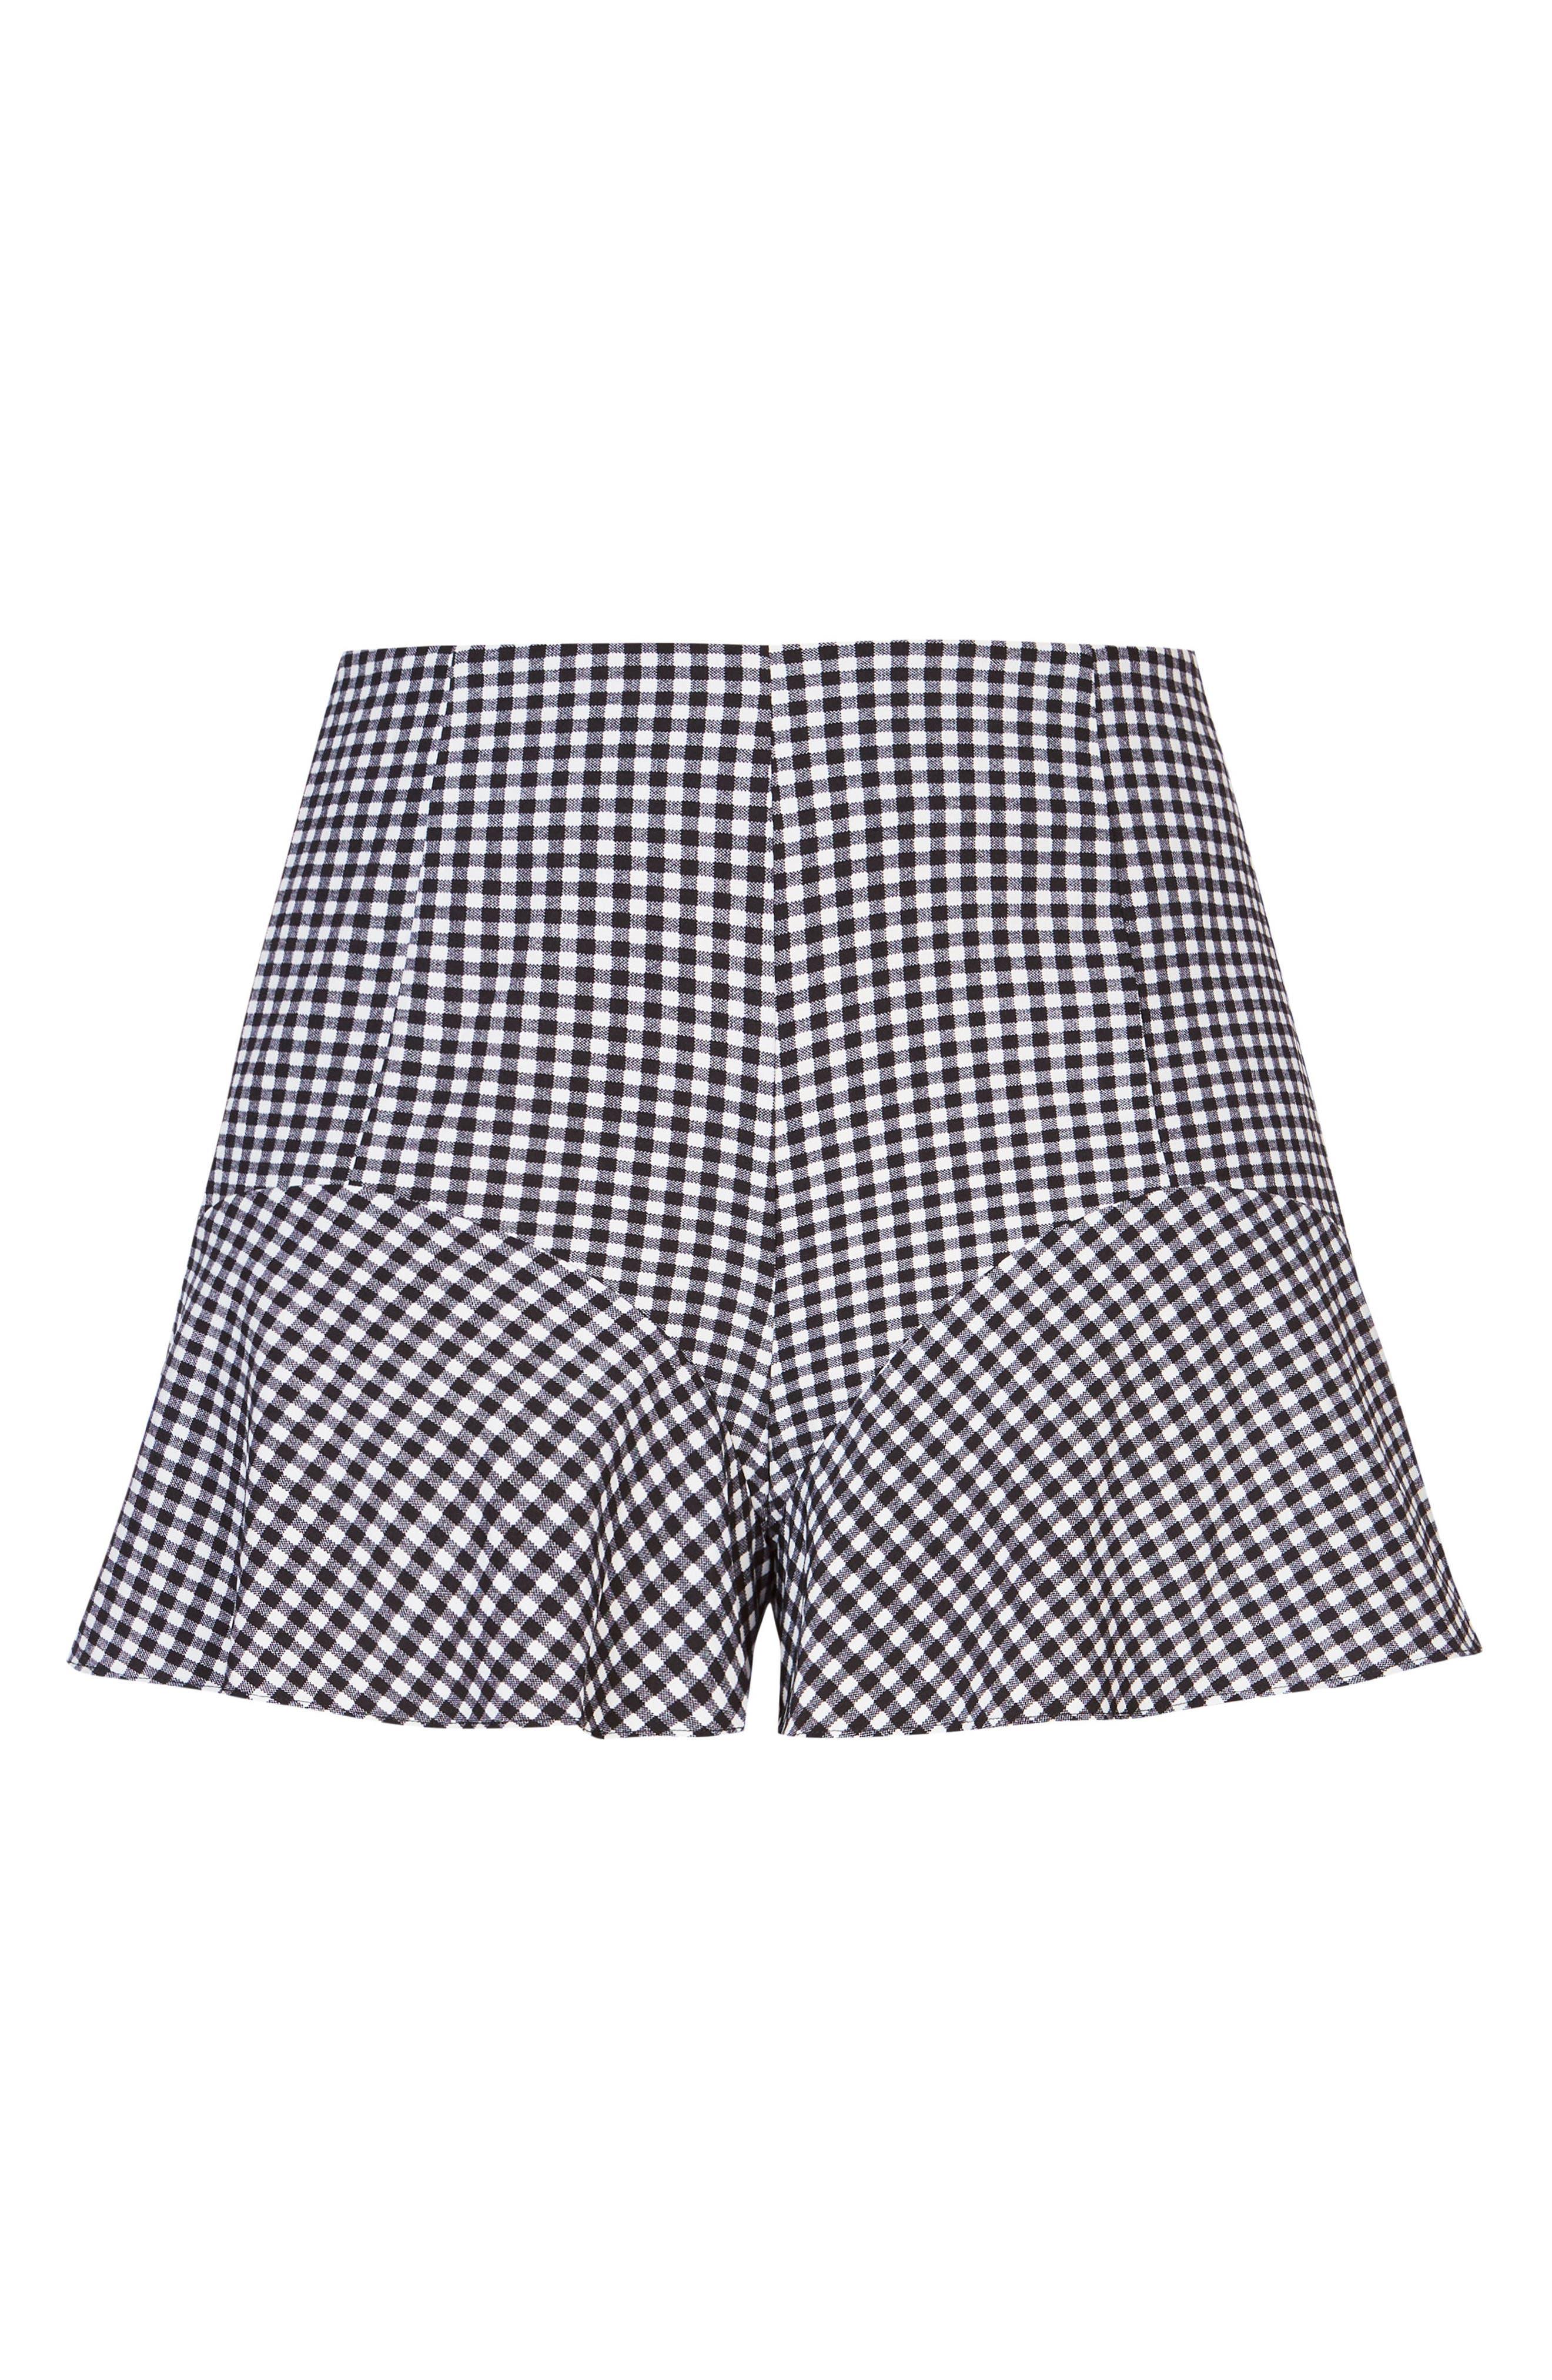 Cute Gingham Flutter Shorts,                             Alternate thumbnail 3, color,                             BLACK CHECK